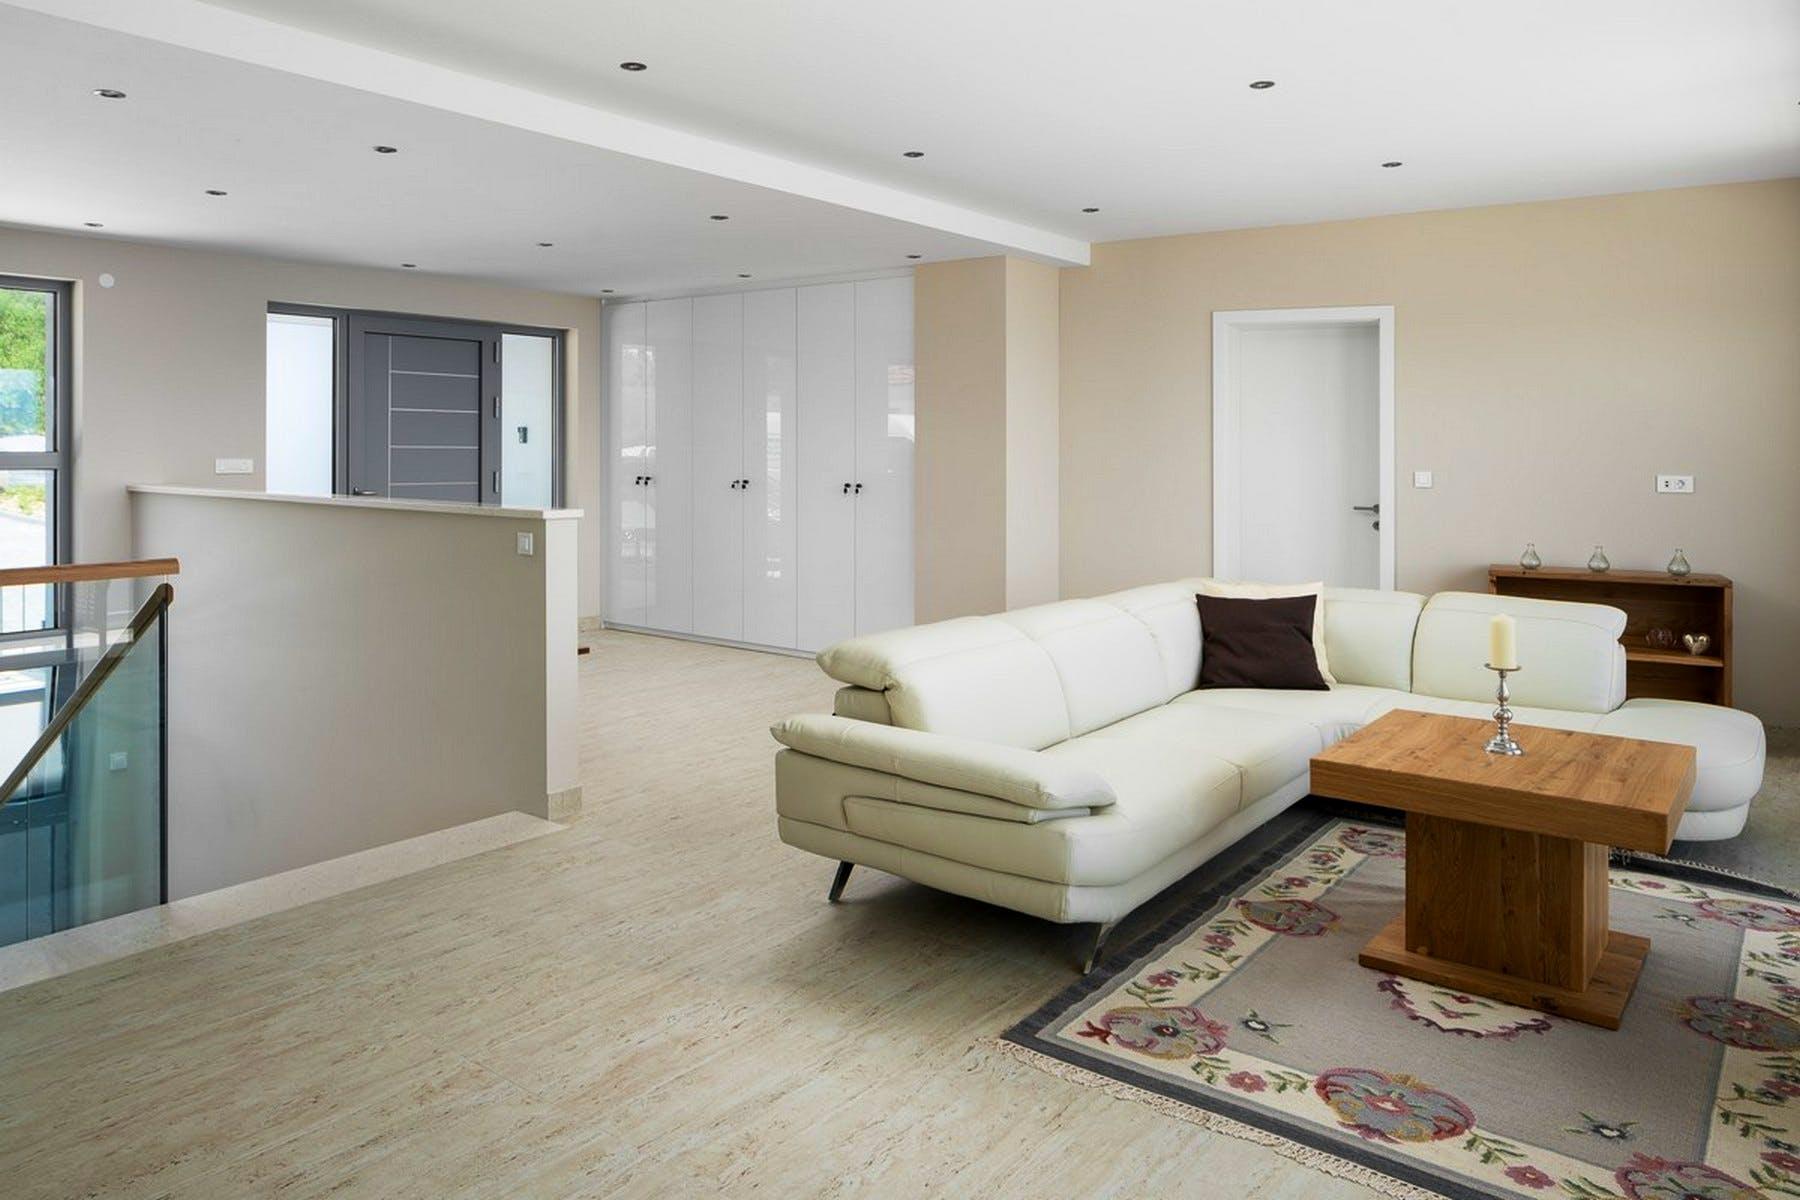 Modernly designed living room space